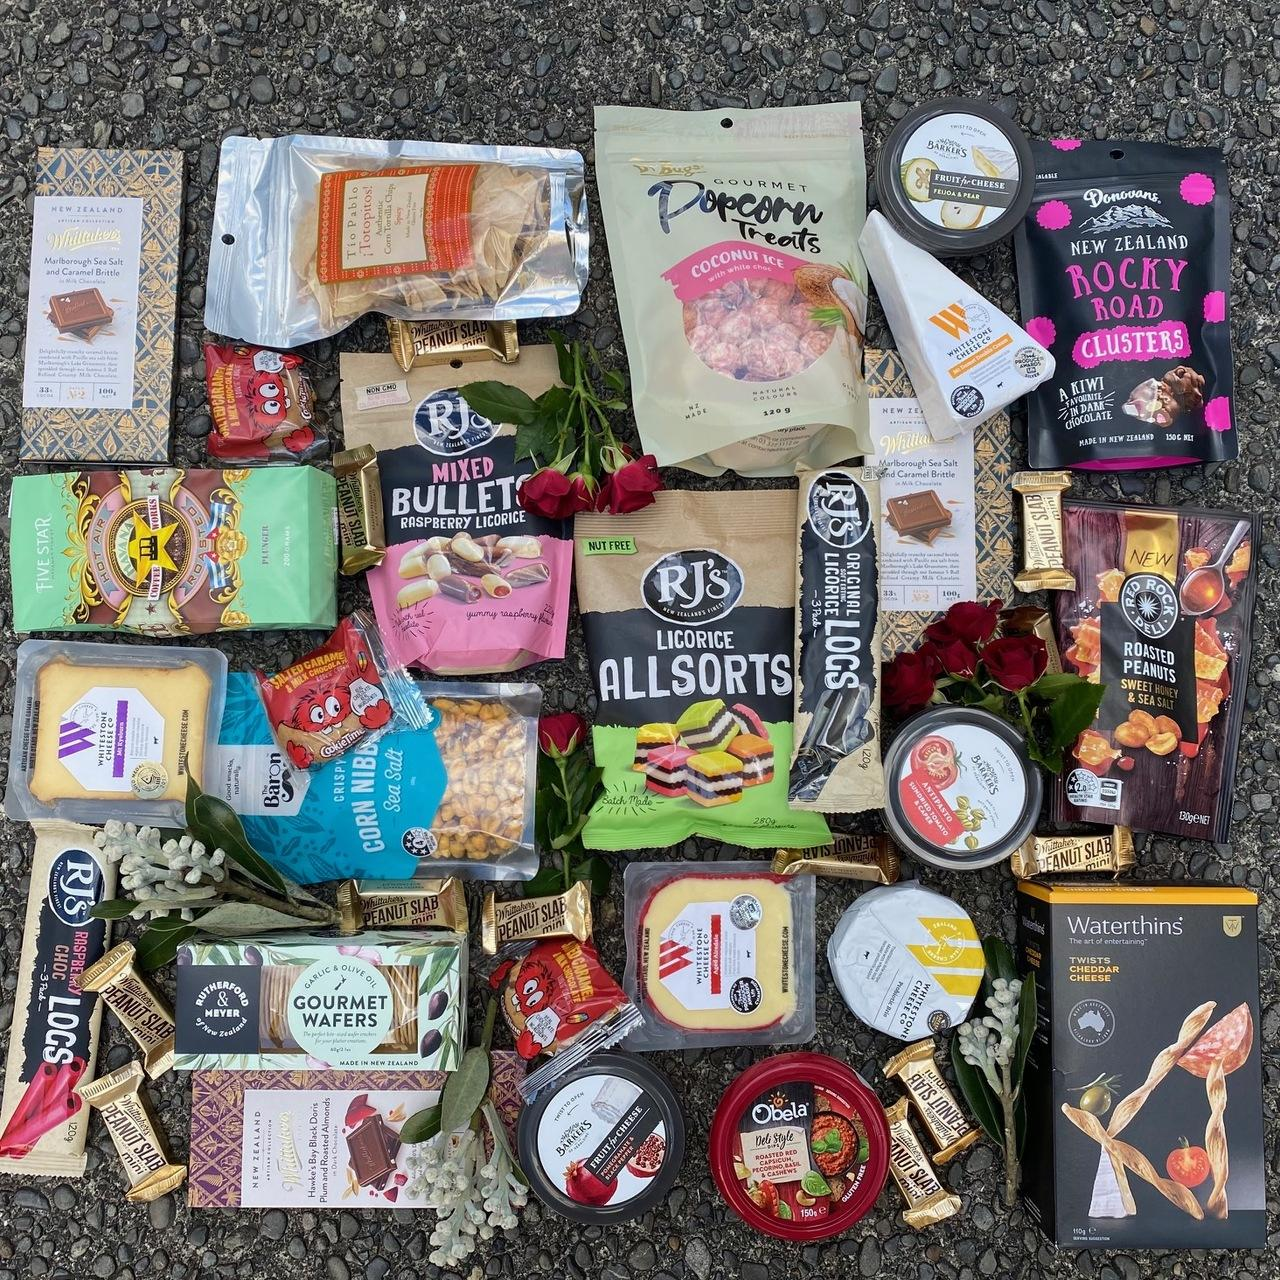 The Woburn gift box